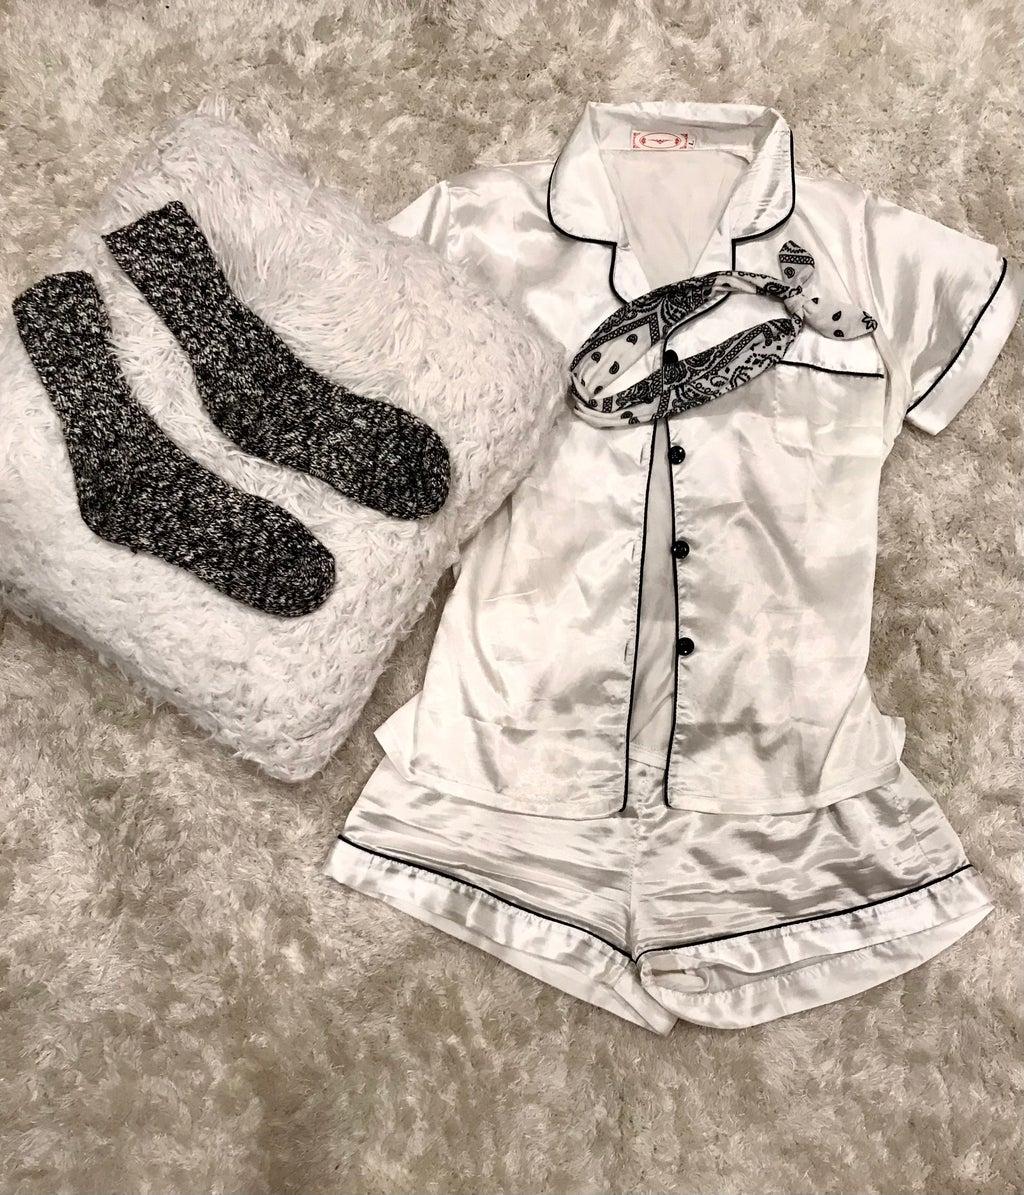 Black and white satin pajama set from SHEIN. Black and white socks and headband. White carpet.